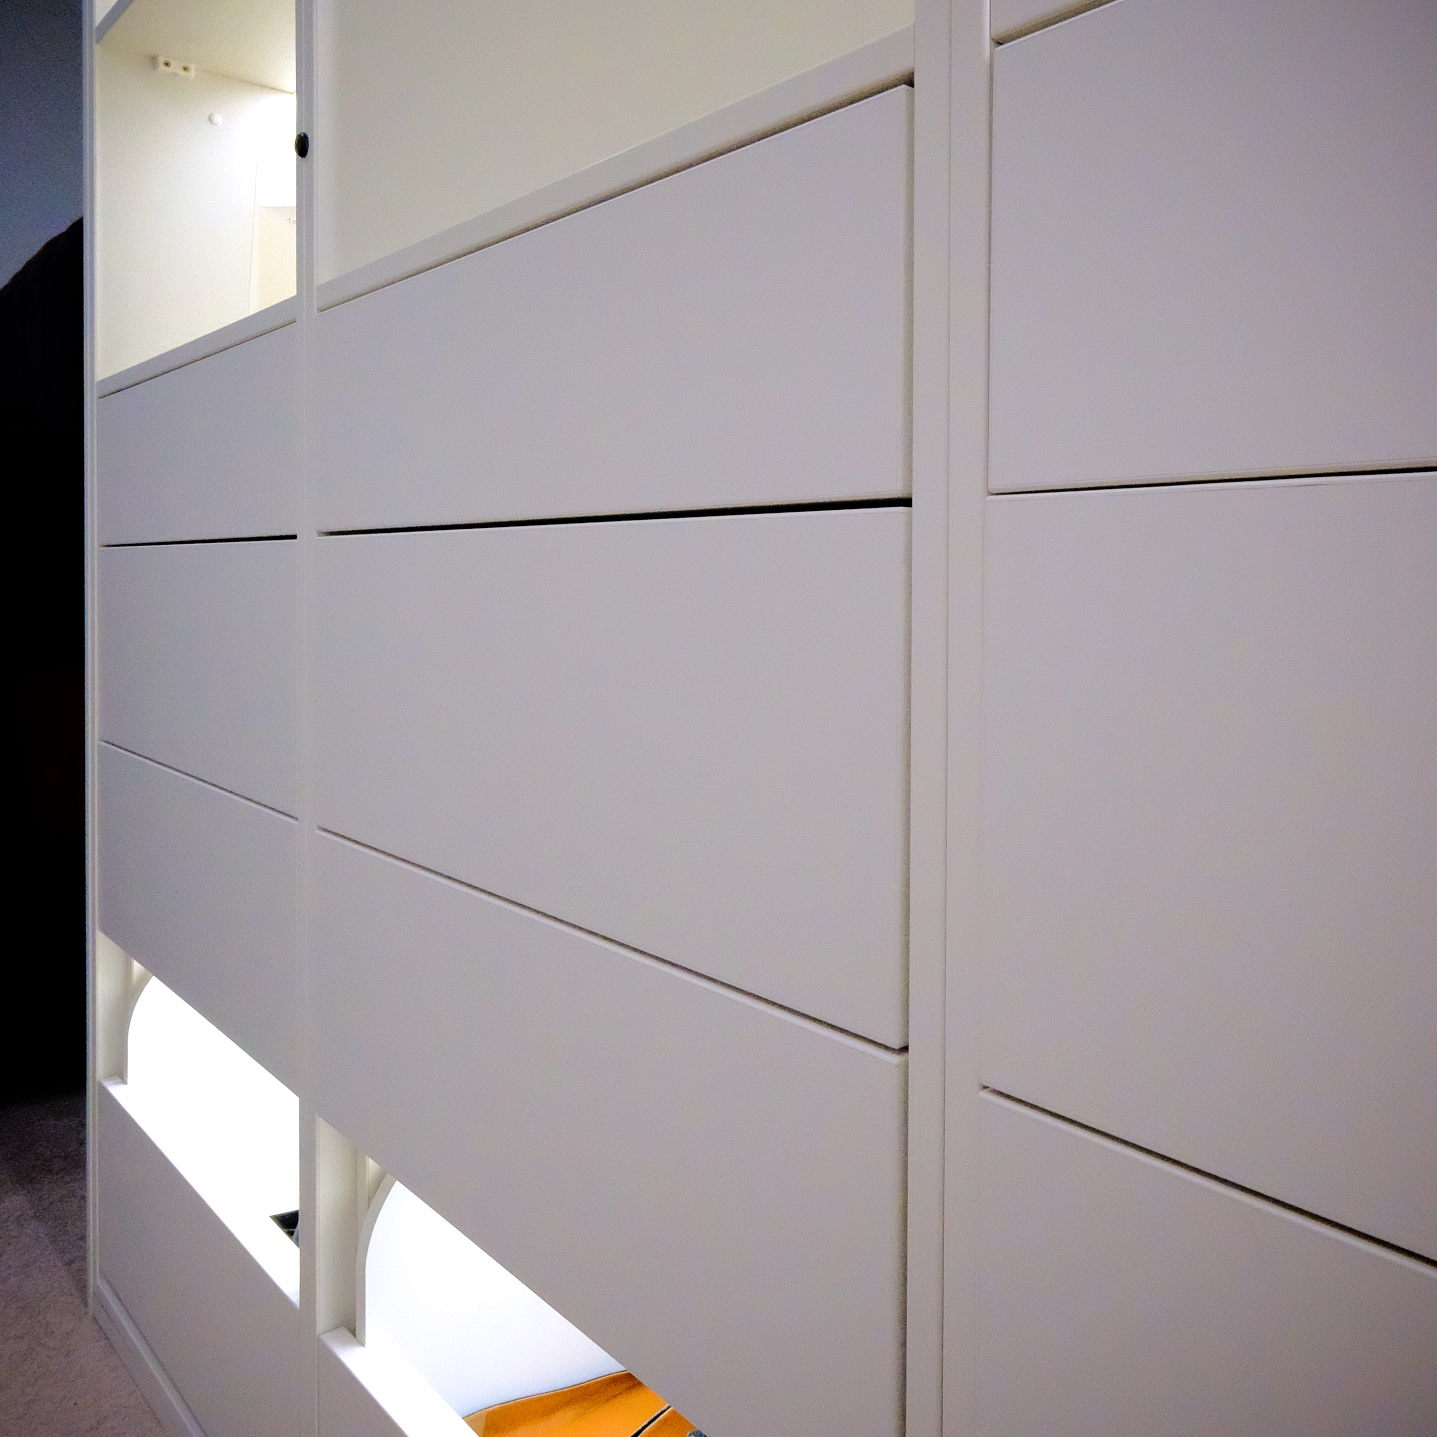 Handle-less BLUM drawers